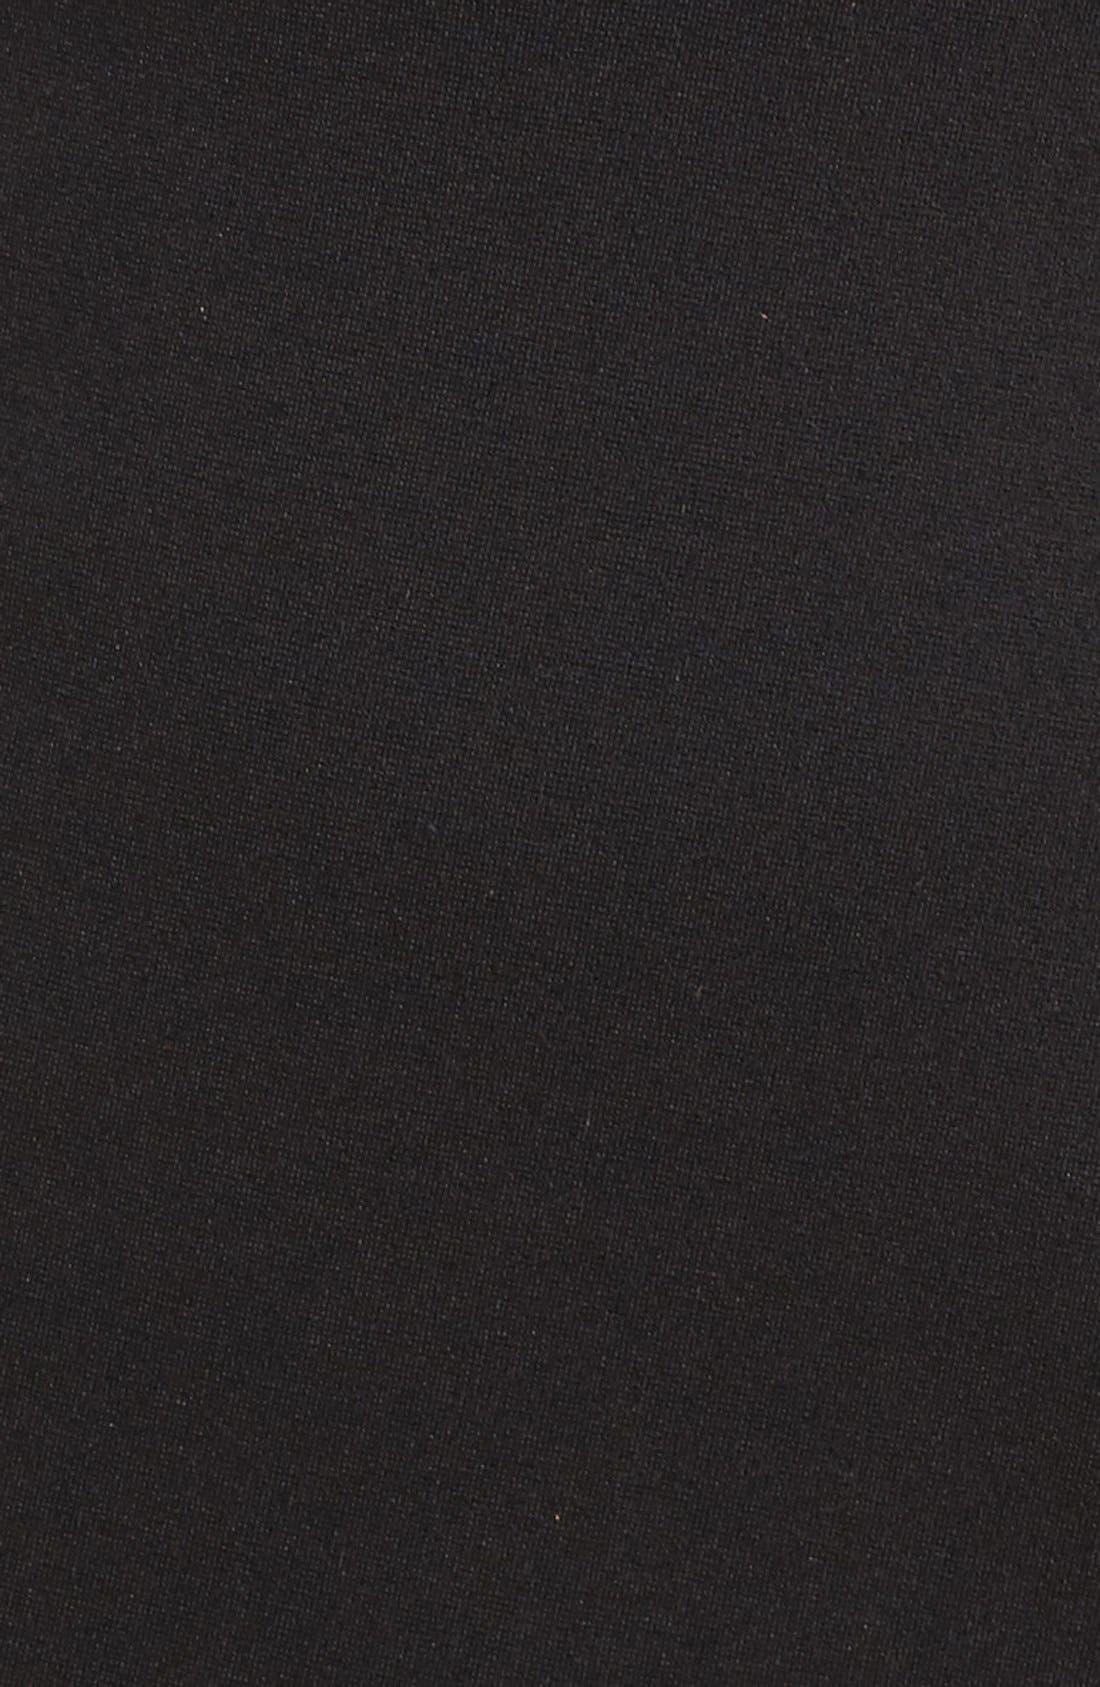 Ponte Cutout Sheath Dress,                             Alternate thumbnail 6, color,                             Black